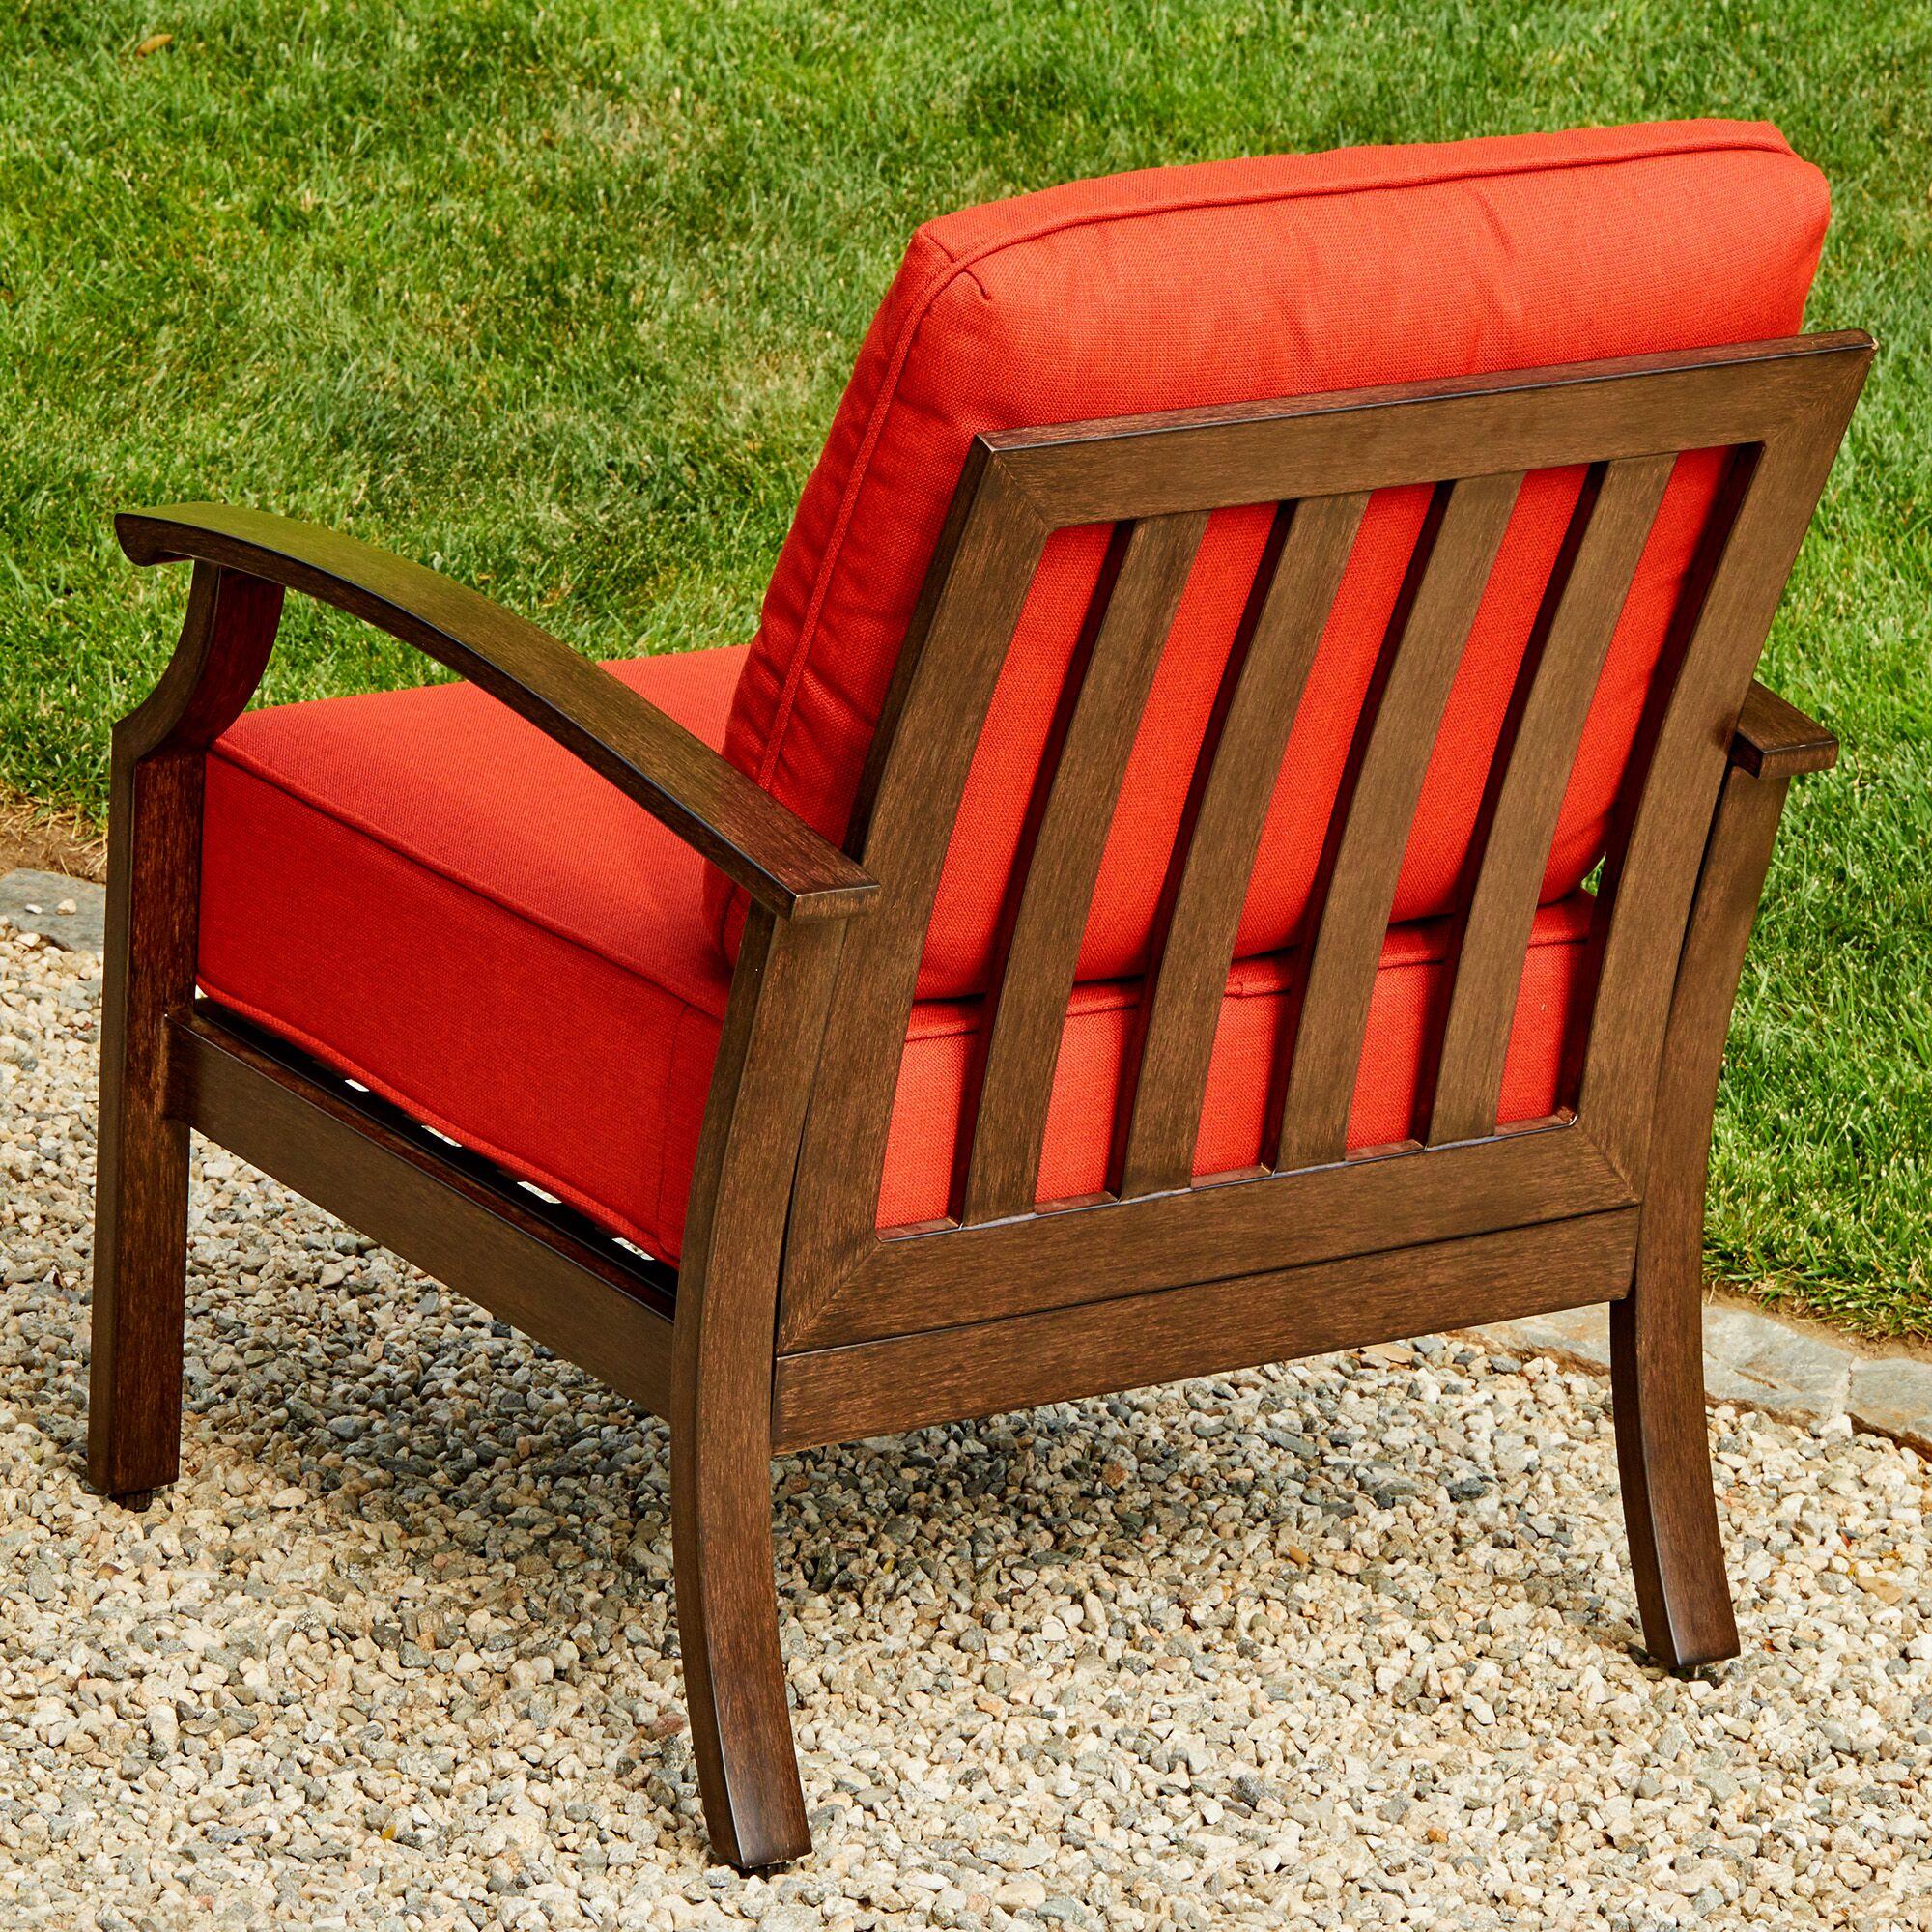 Yandel Bridgeport 3 Piece Conversation Set with Cushions Cushion Color: Red